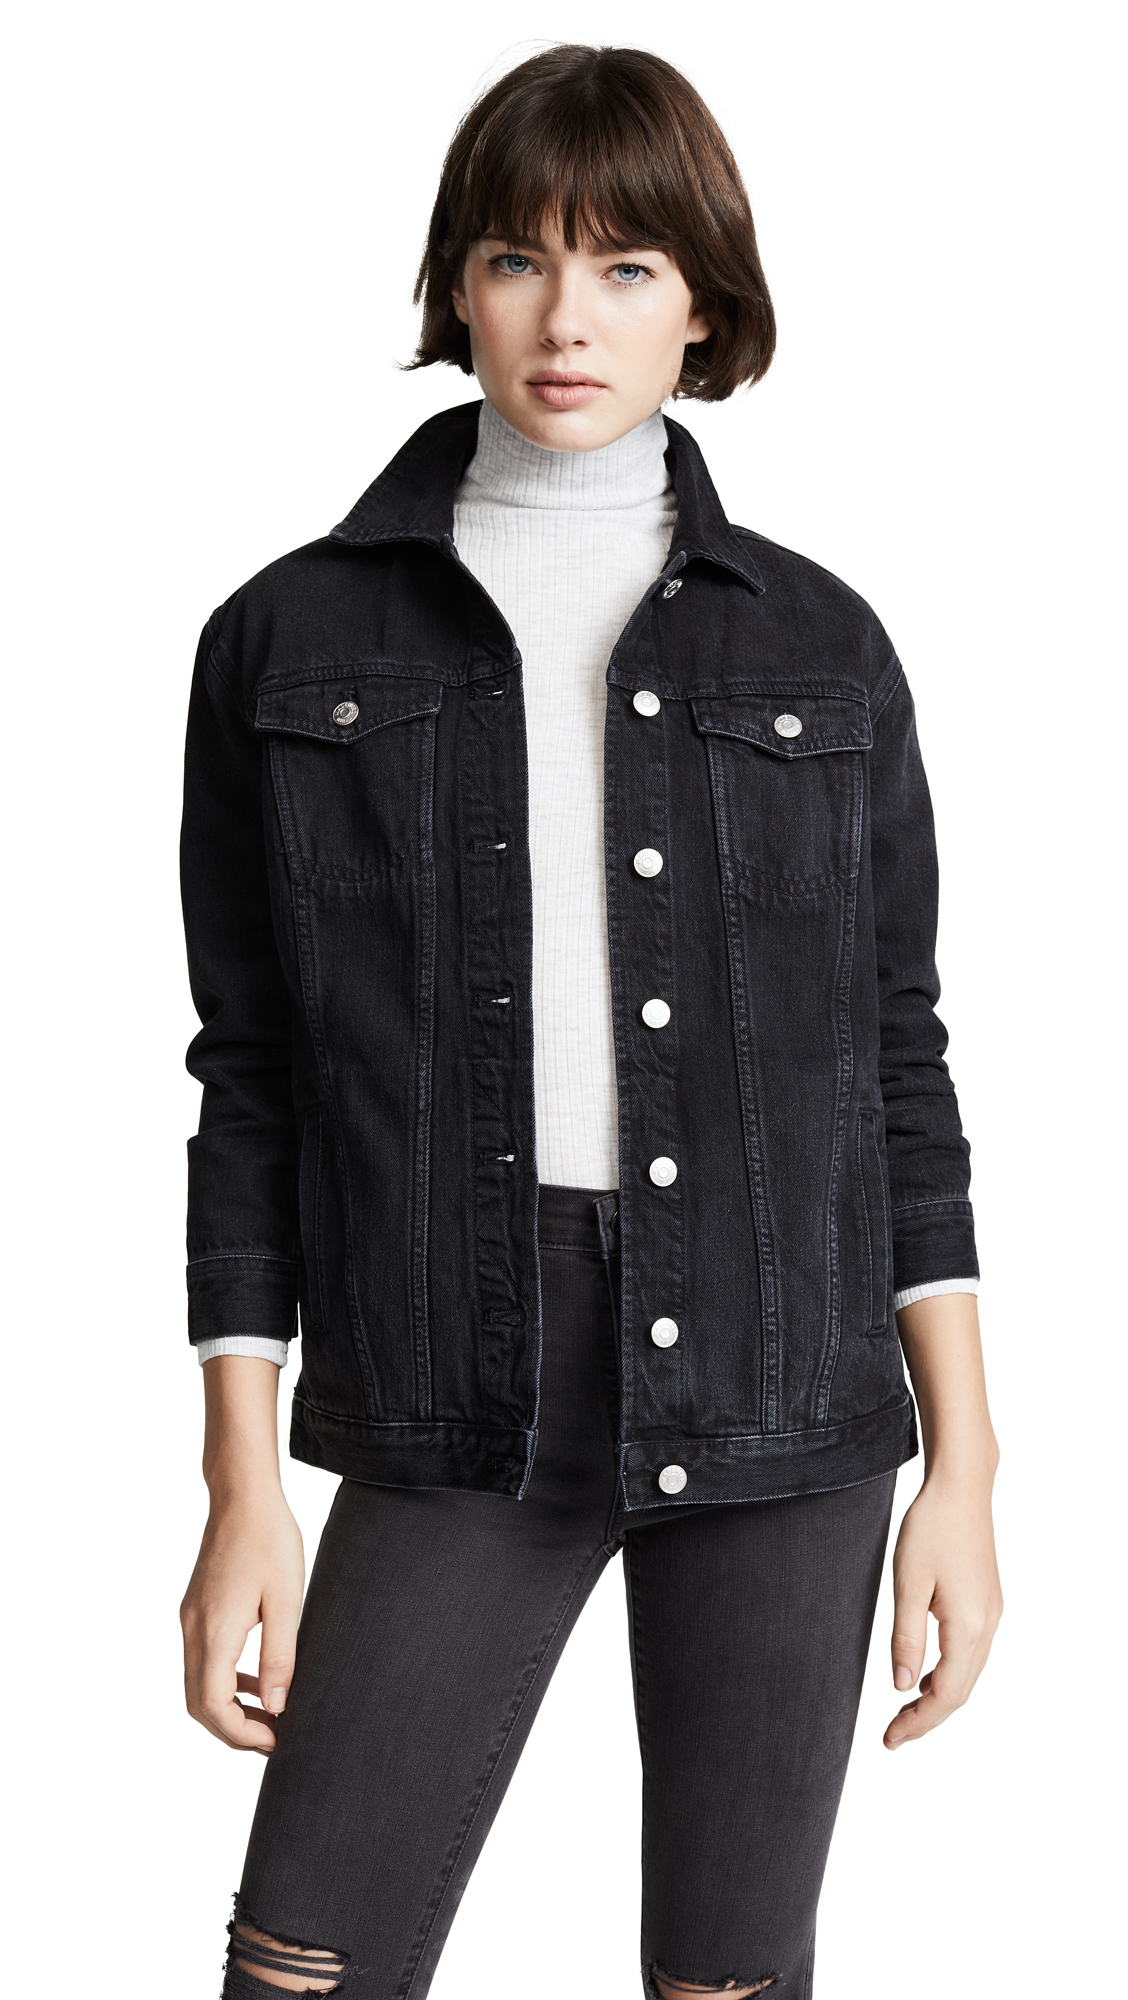 Madewell Oversized Jean Jacket - Lunar Wash